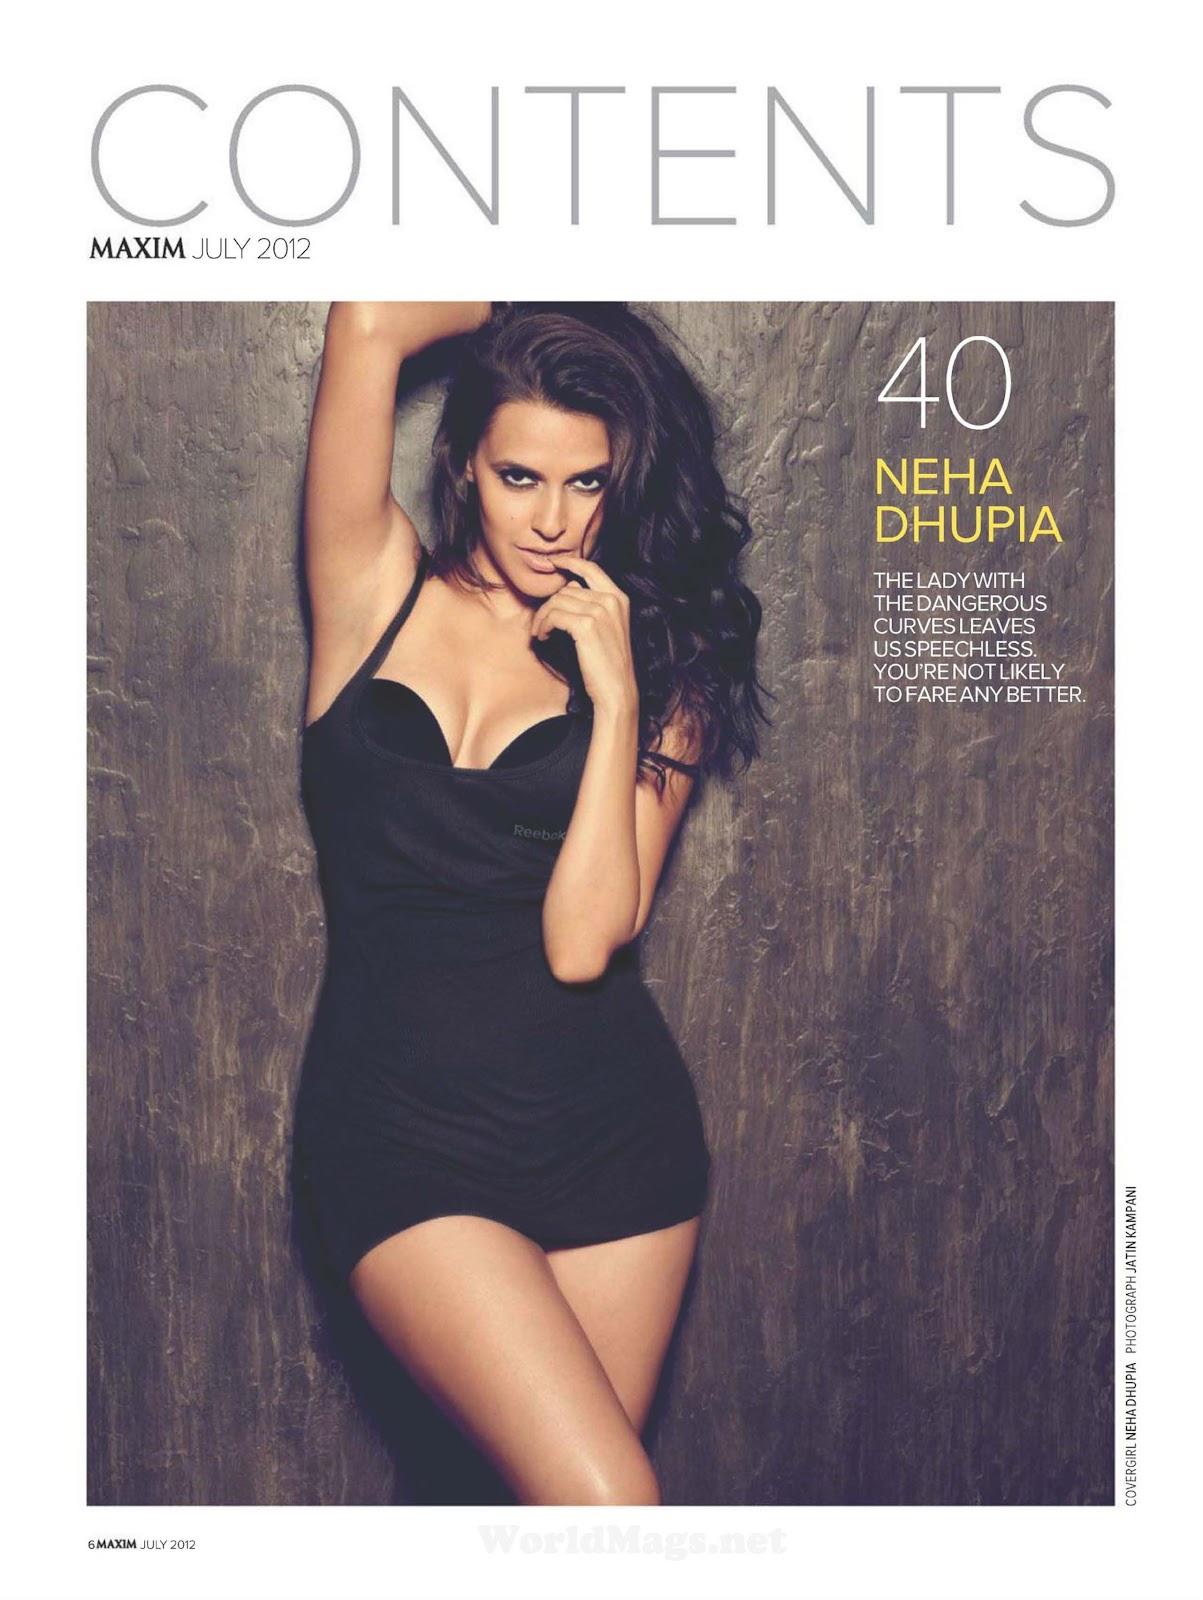 Desi Actress Pictures Neha Dhupia Maxim Magazine Hot Photos-1763